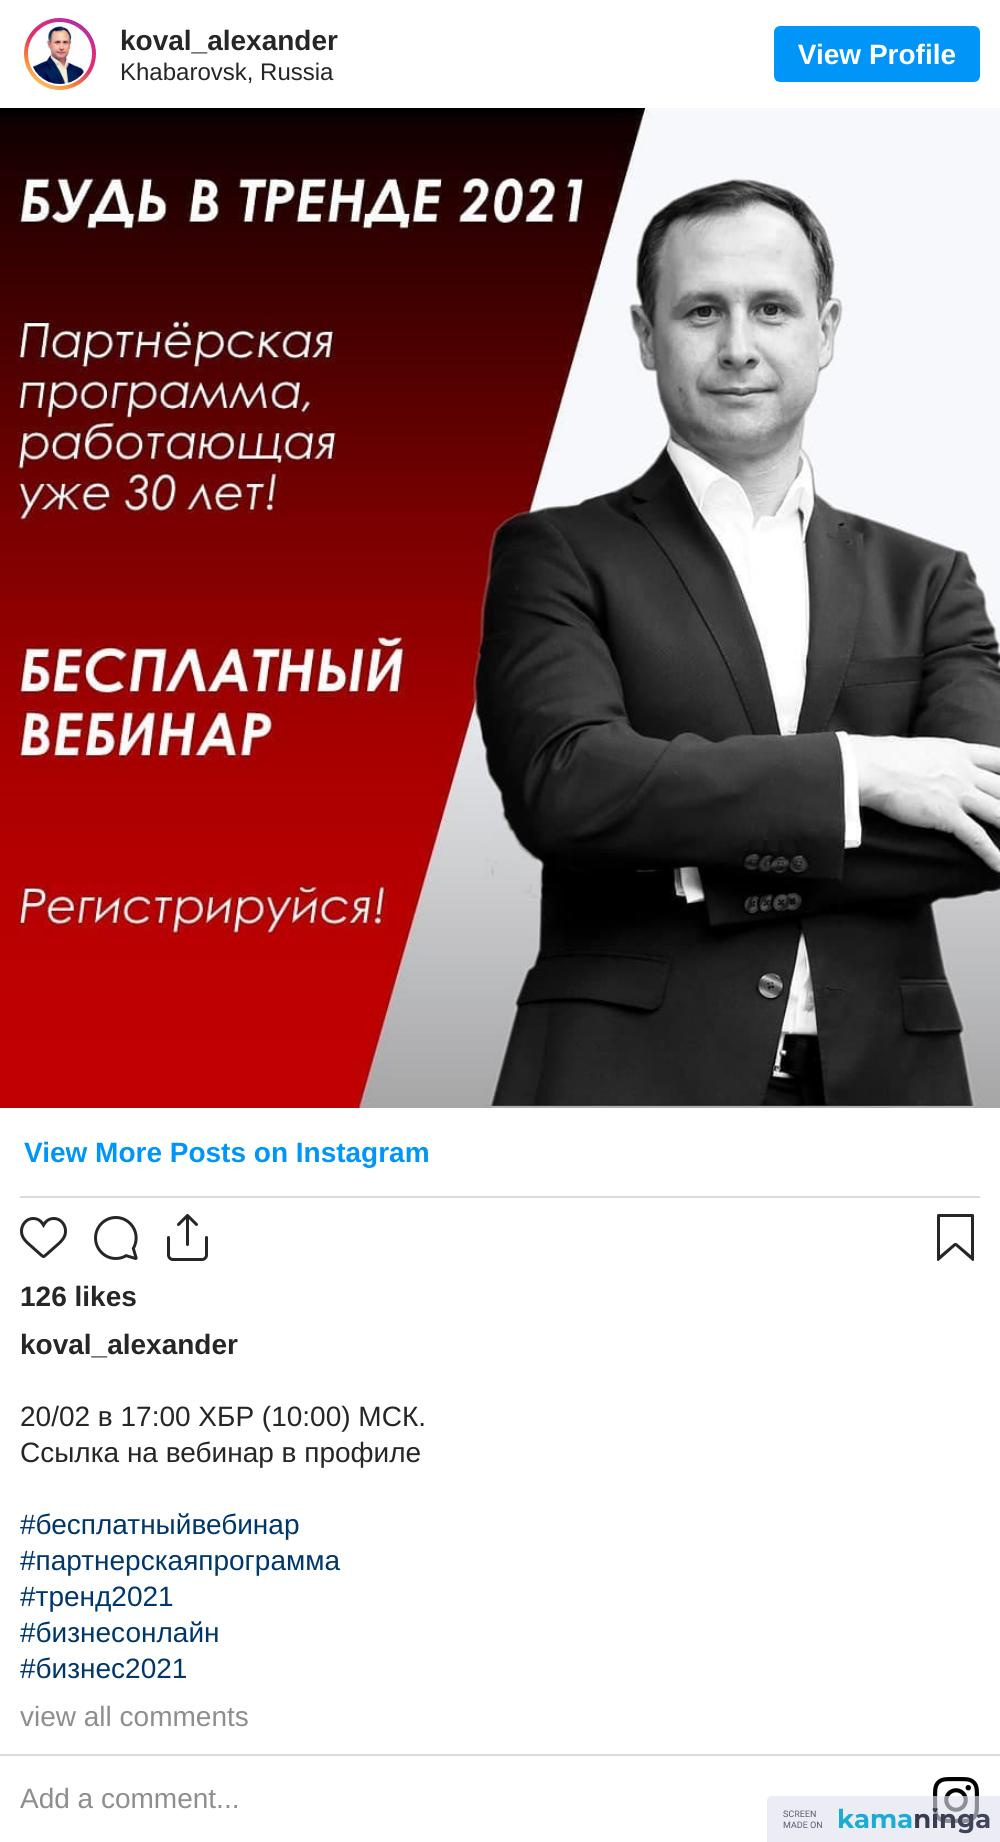 https://www.instagram.com/p/CLLq7SEgXd_/